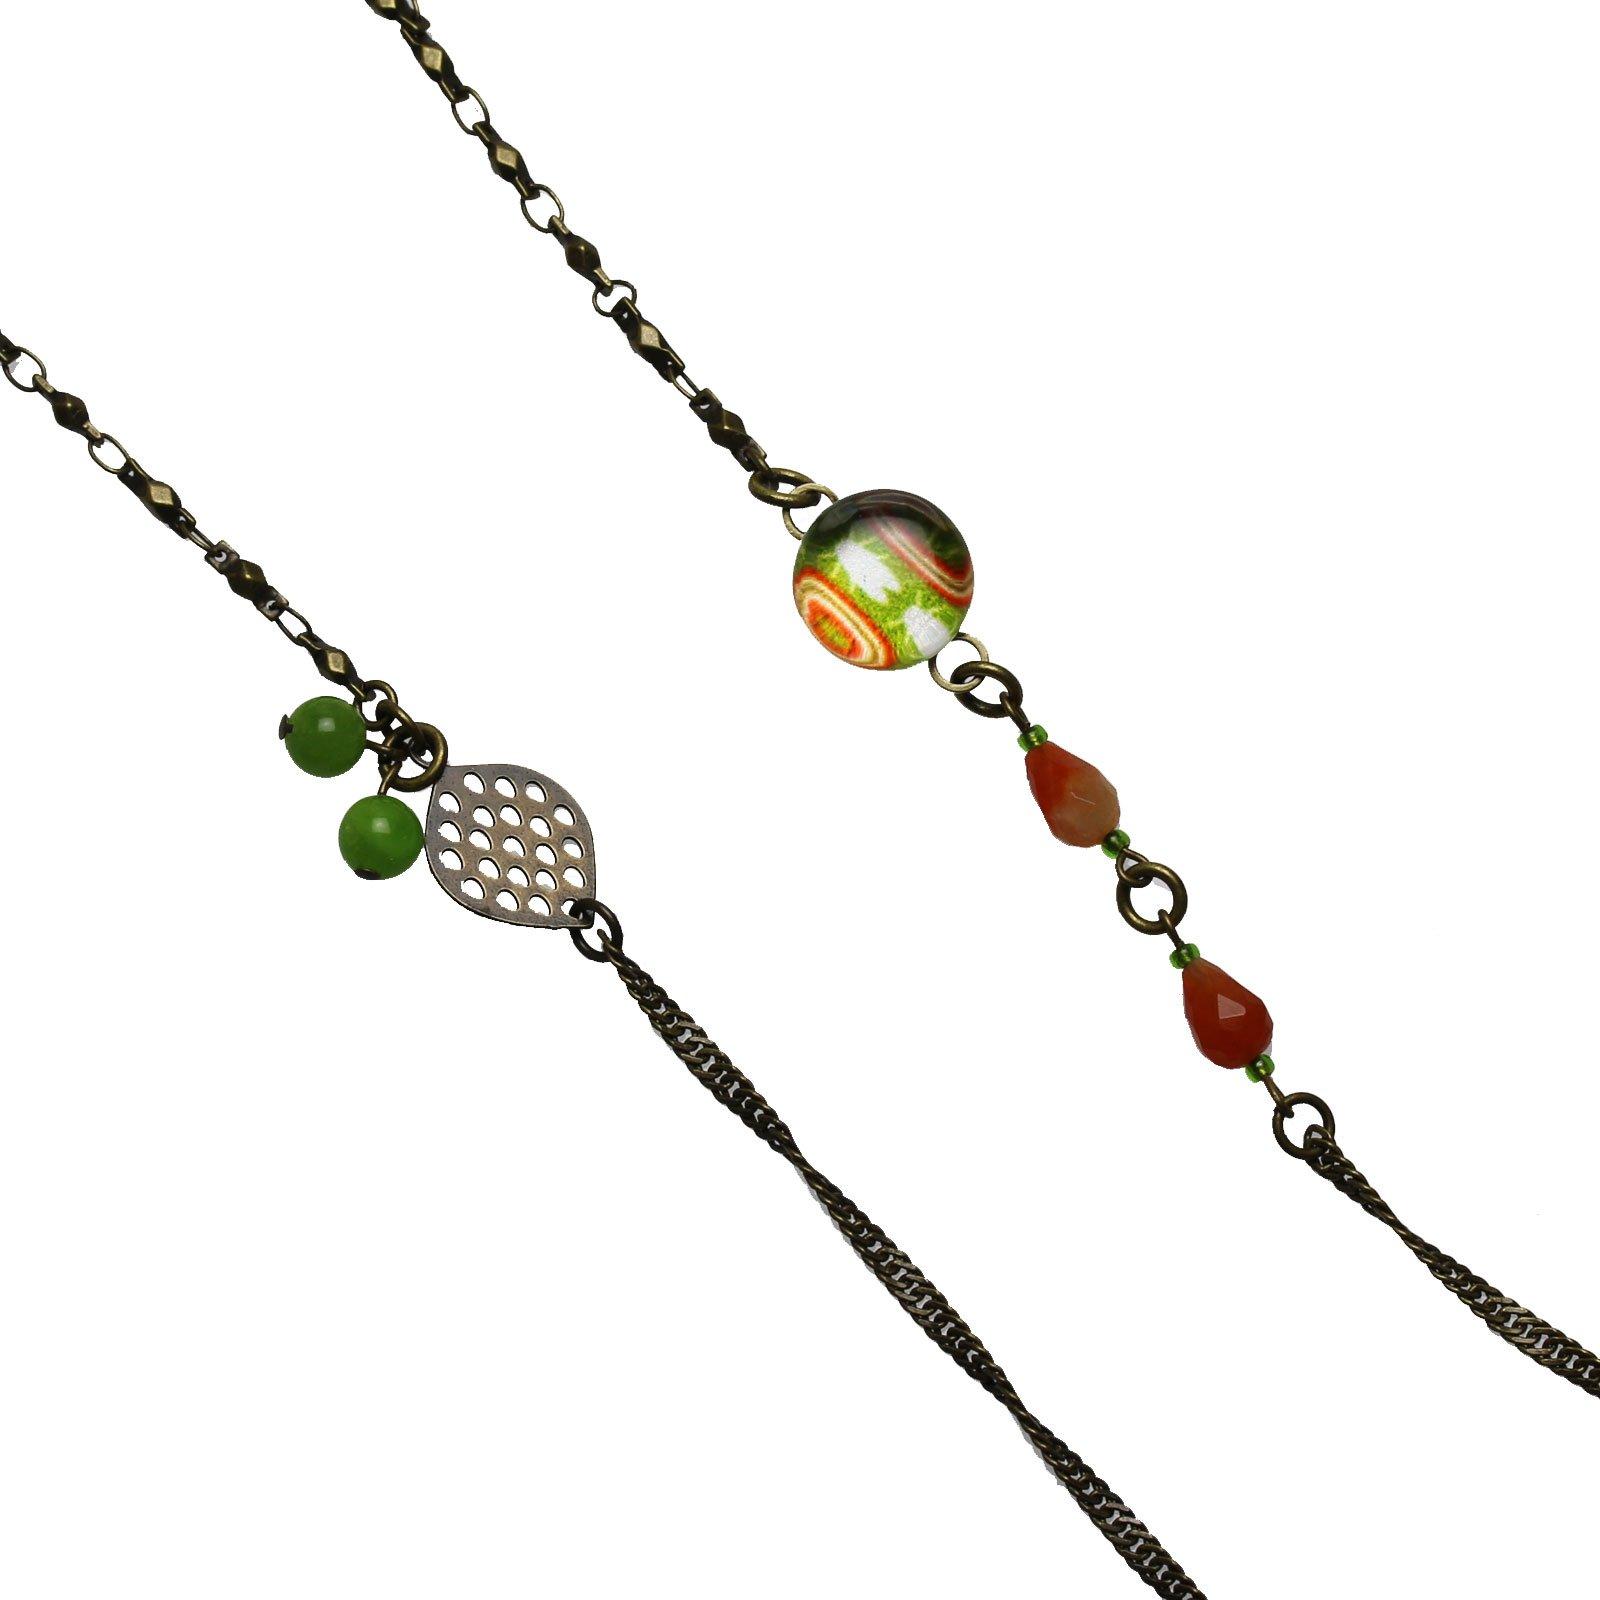 Tamarusan Glasses Chain Cicada Green Carnelian Glass Cord Handmade by TAMARUSAN (Image #1)